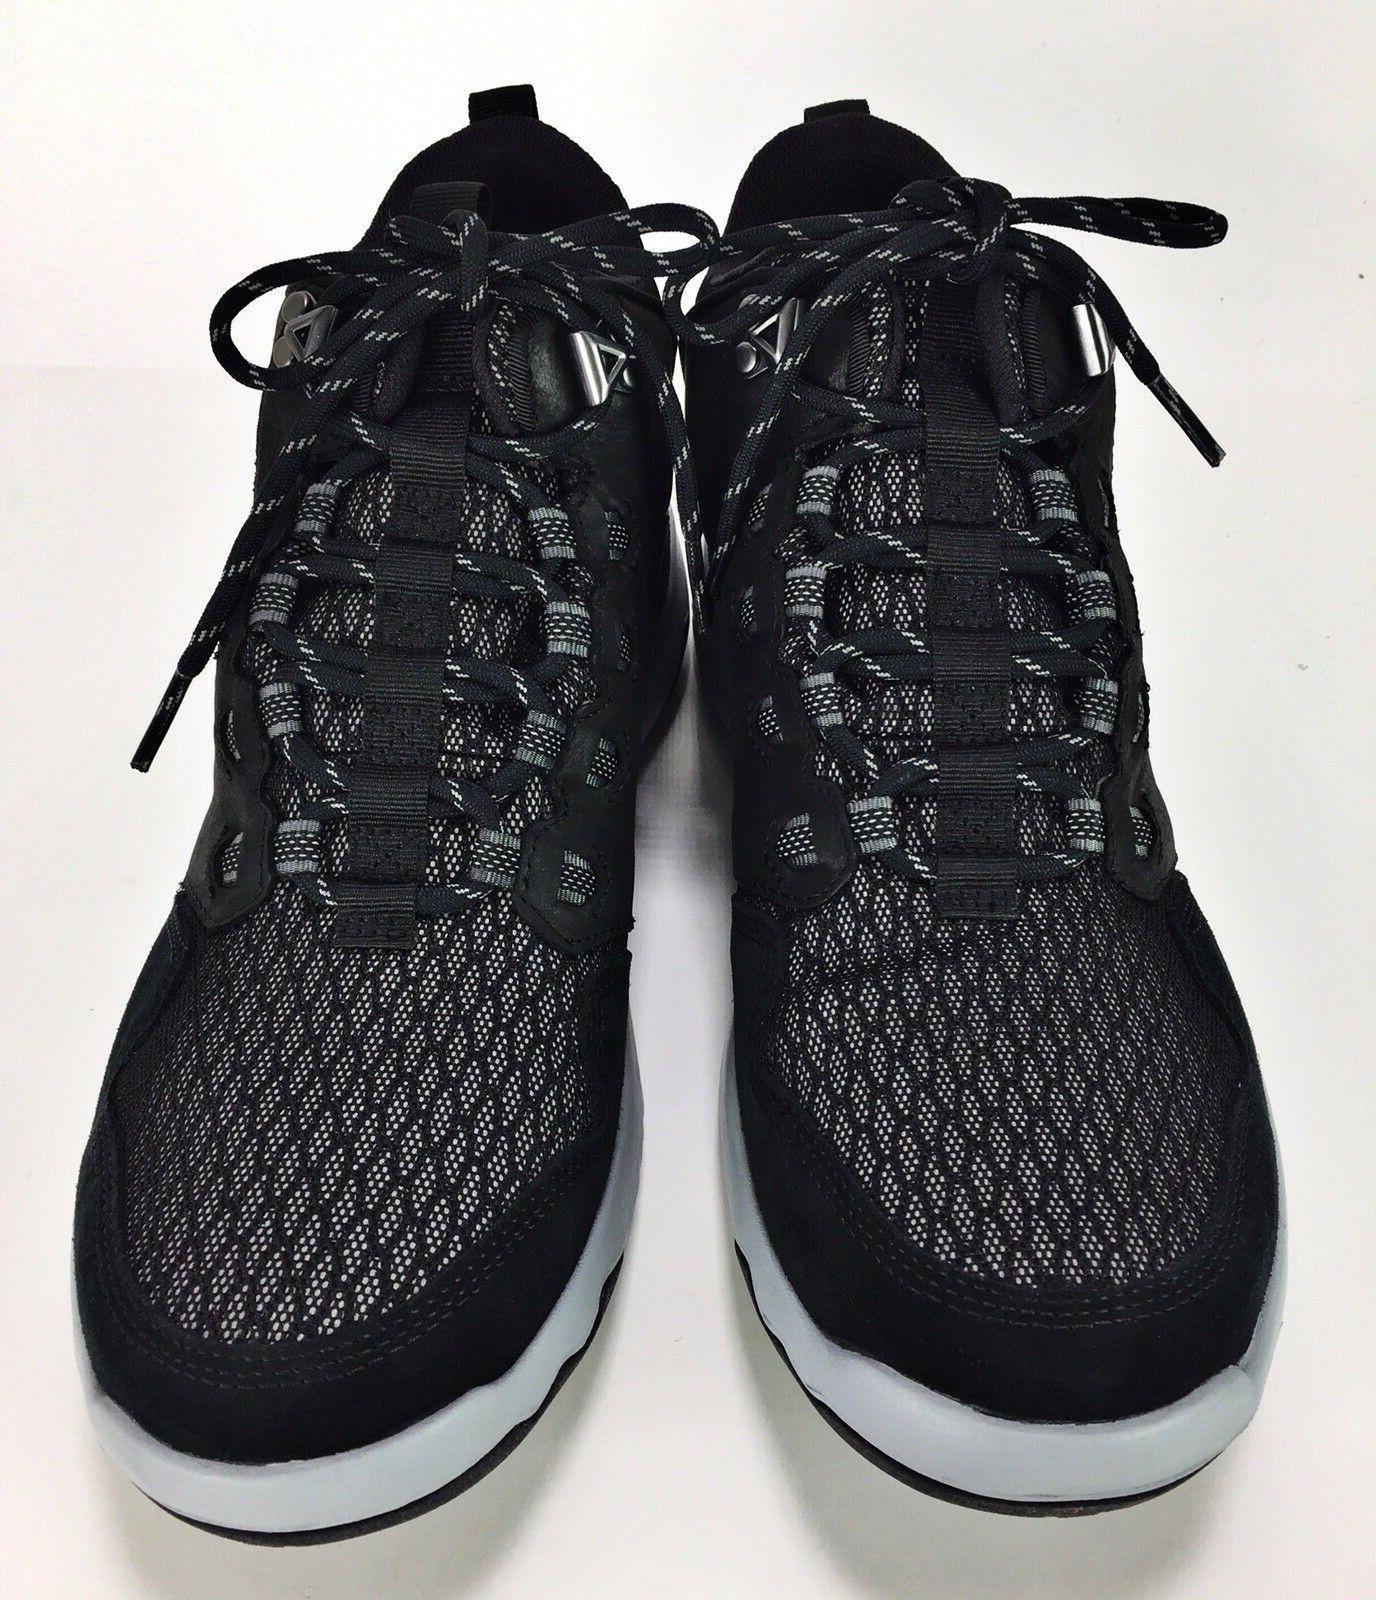 Mens Hiking Boots Lightweight Black